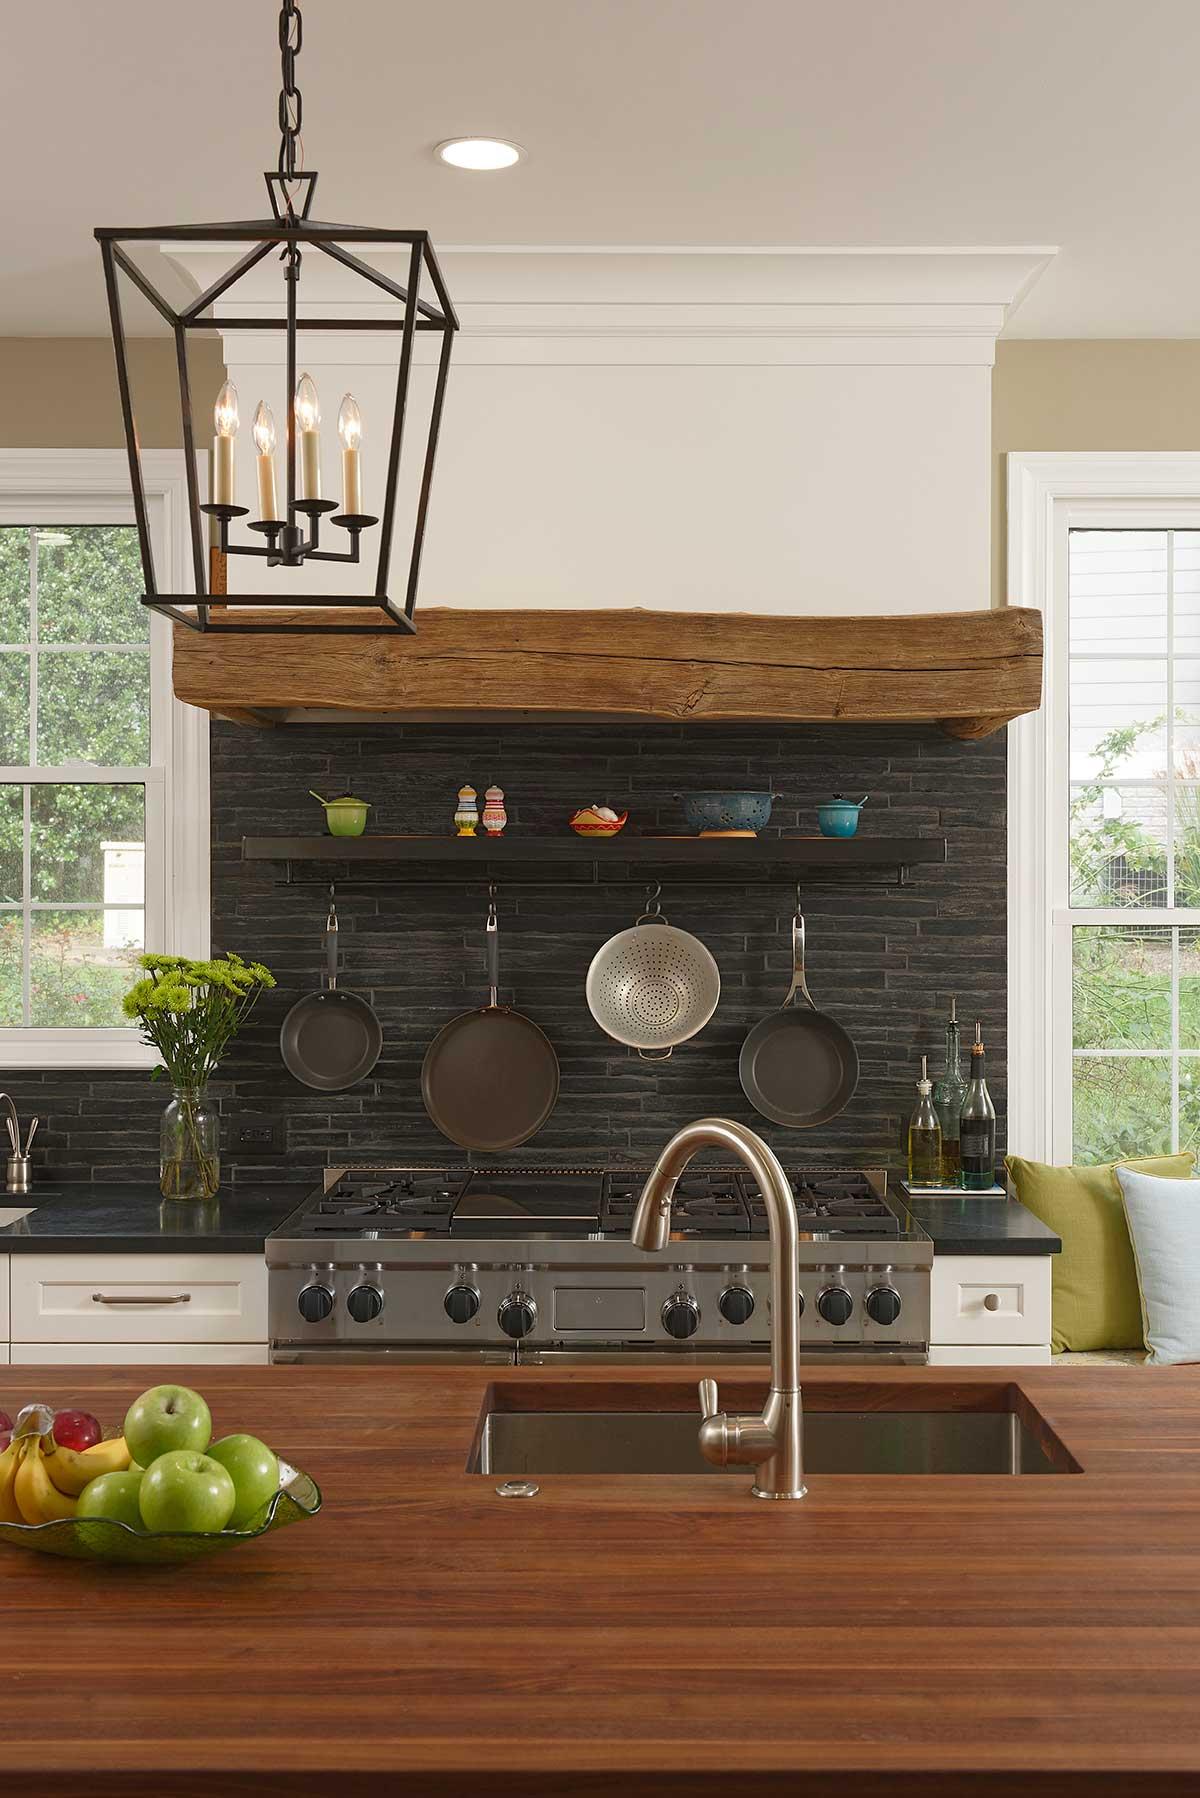 Kitchen Sinks in Wood Countertops